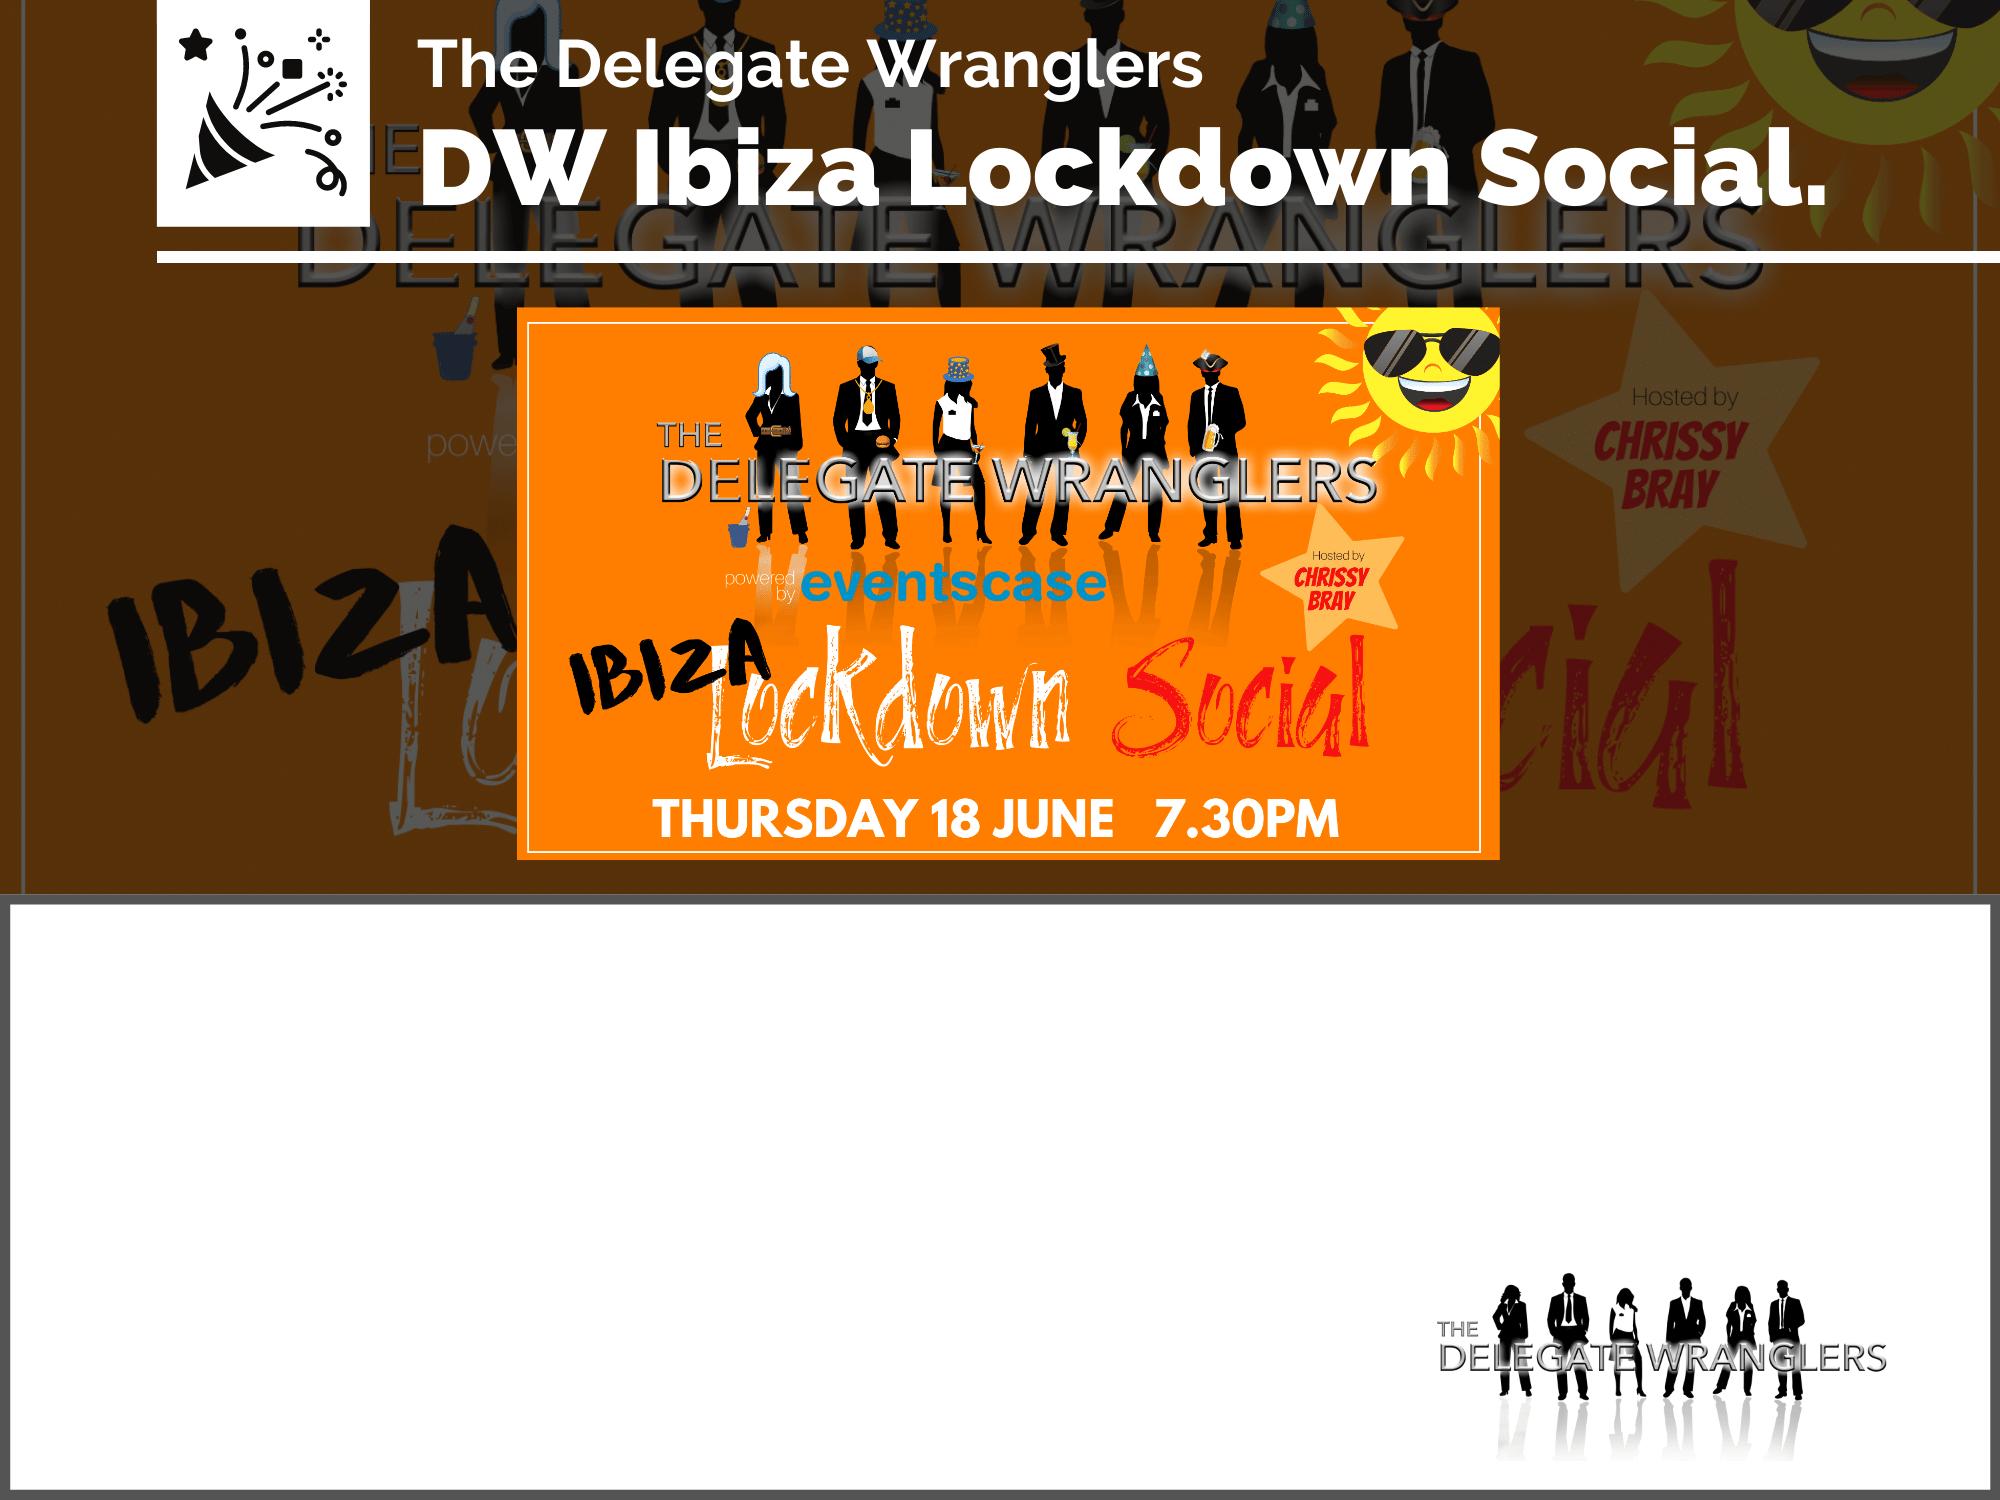 Highlights from DW Ibiza Lockdown Social